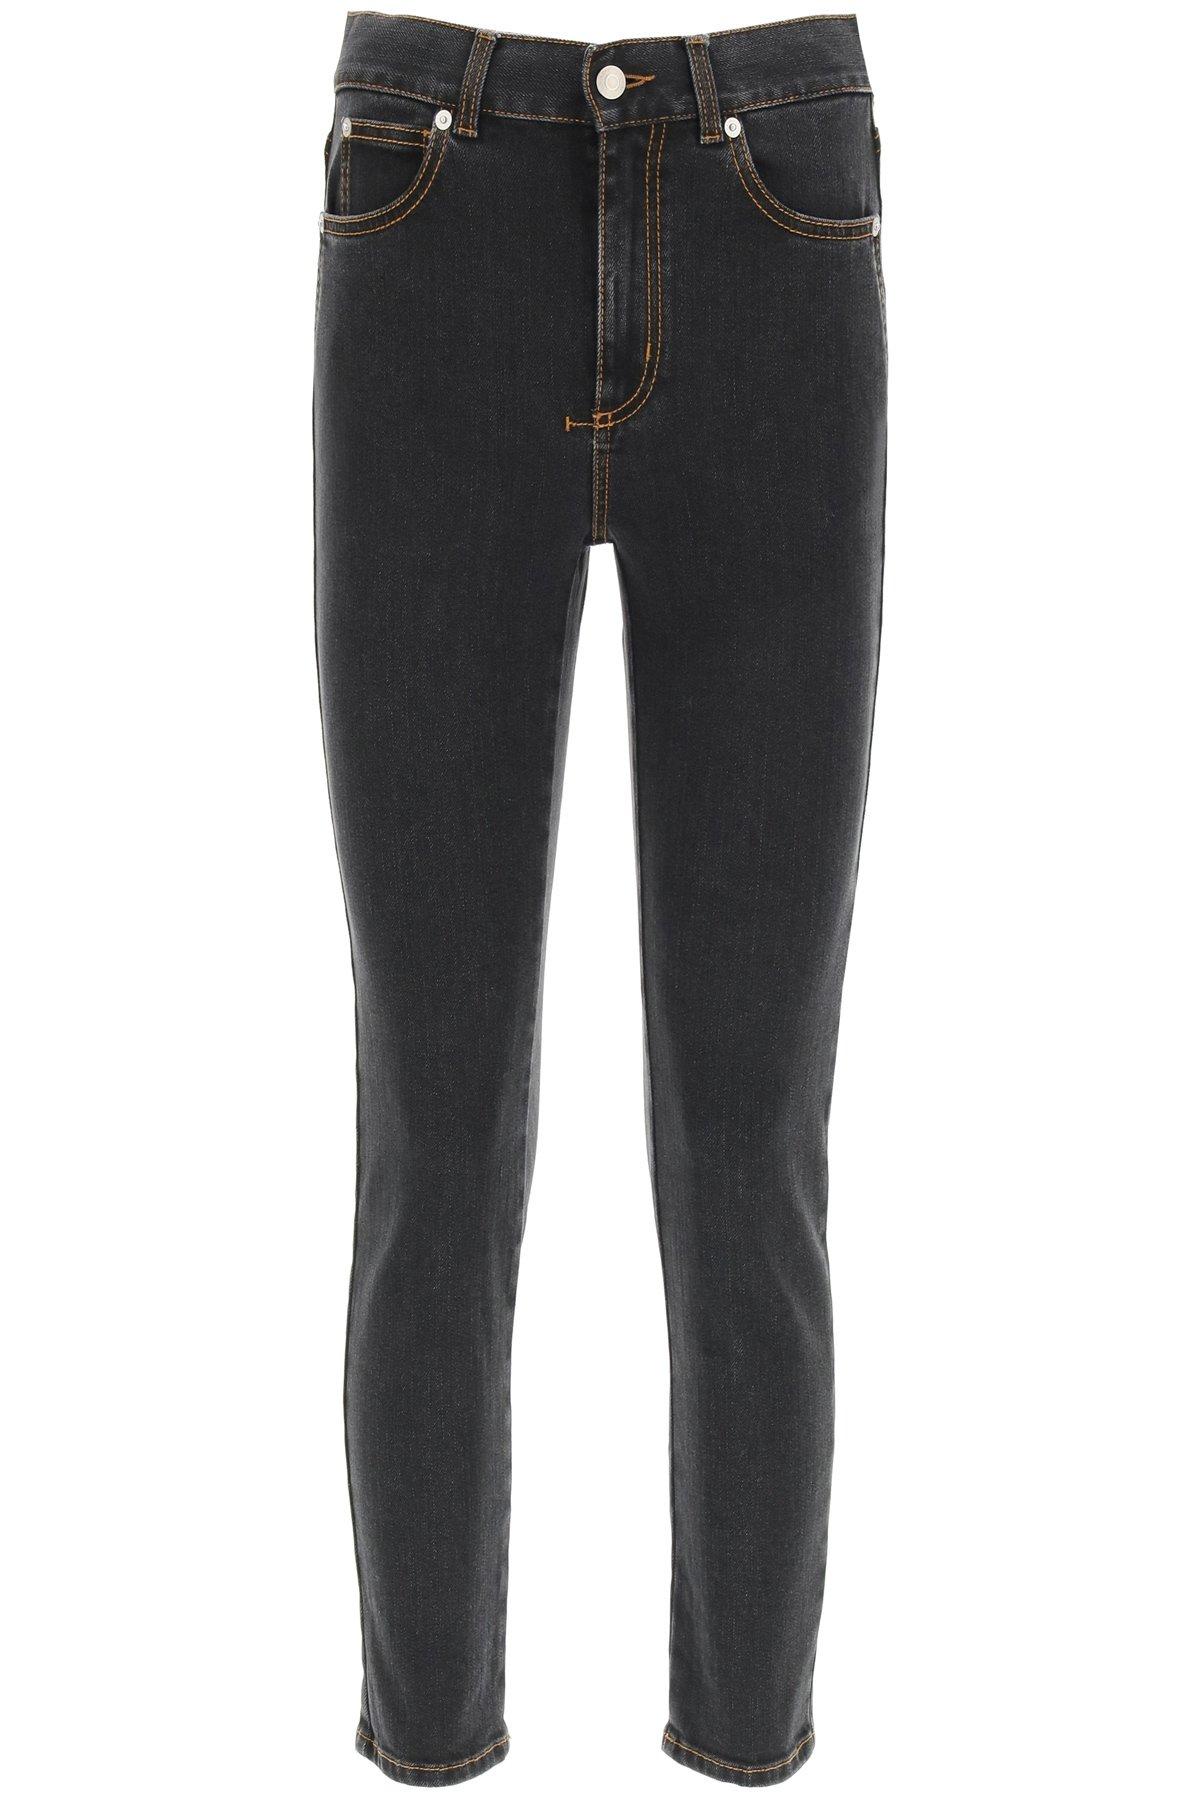 Alexander mcqueen jeans a vita alta